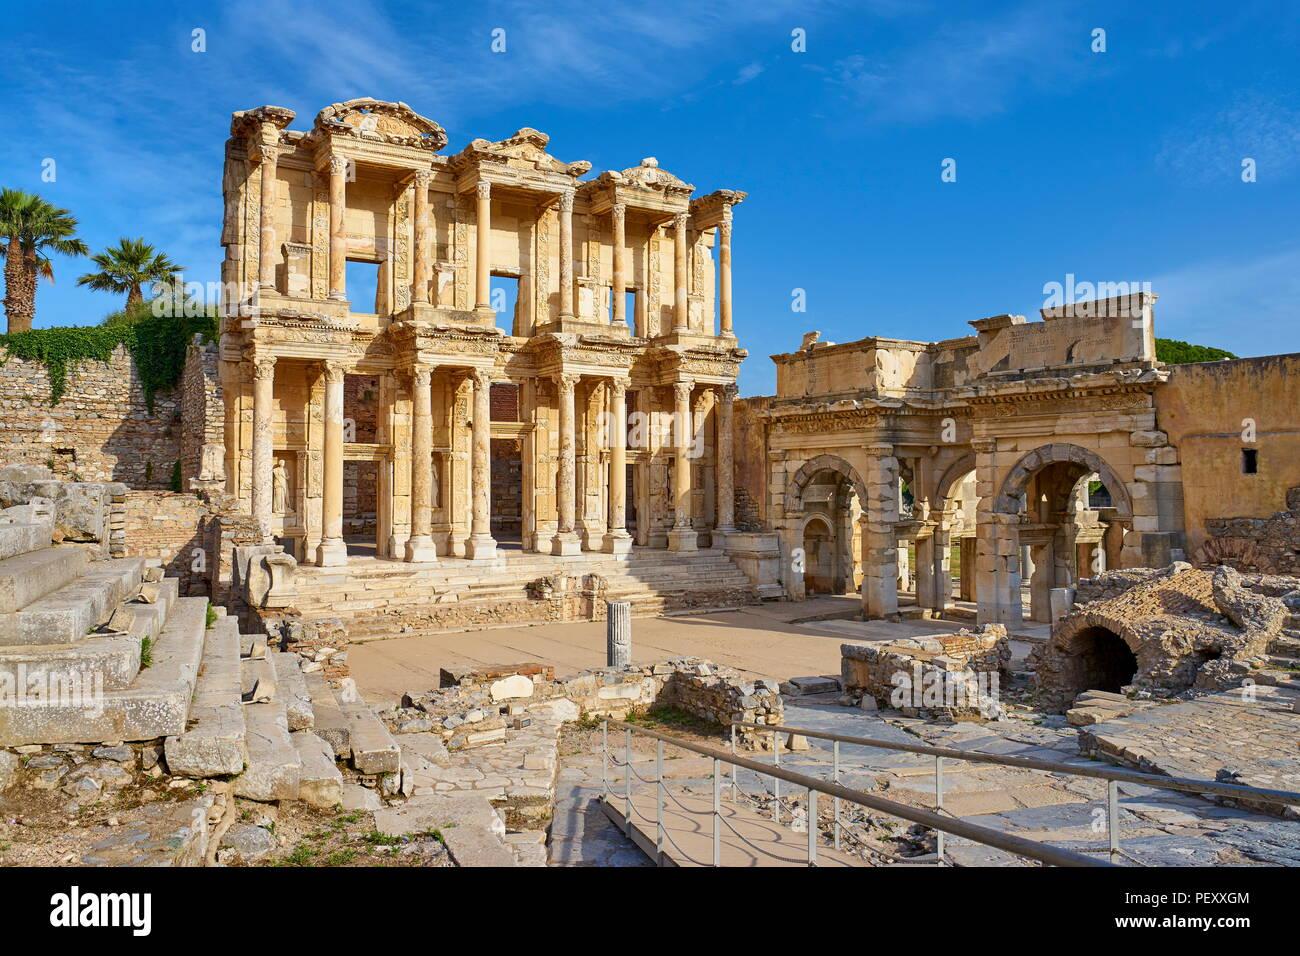 Efes - Bibliothek des Kelsos in Ephesus antike Stadt, Izmir, Türkei Stockbild